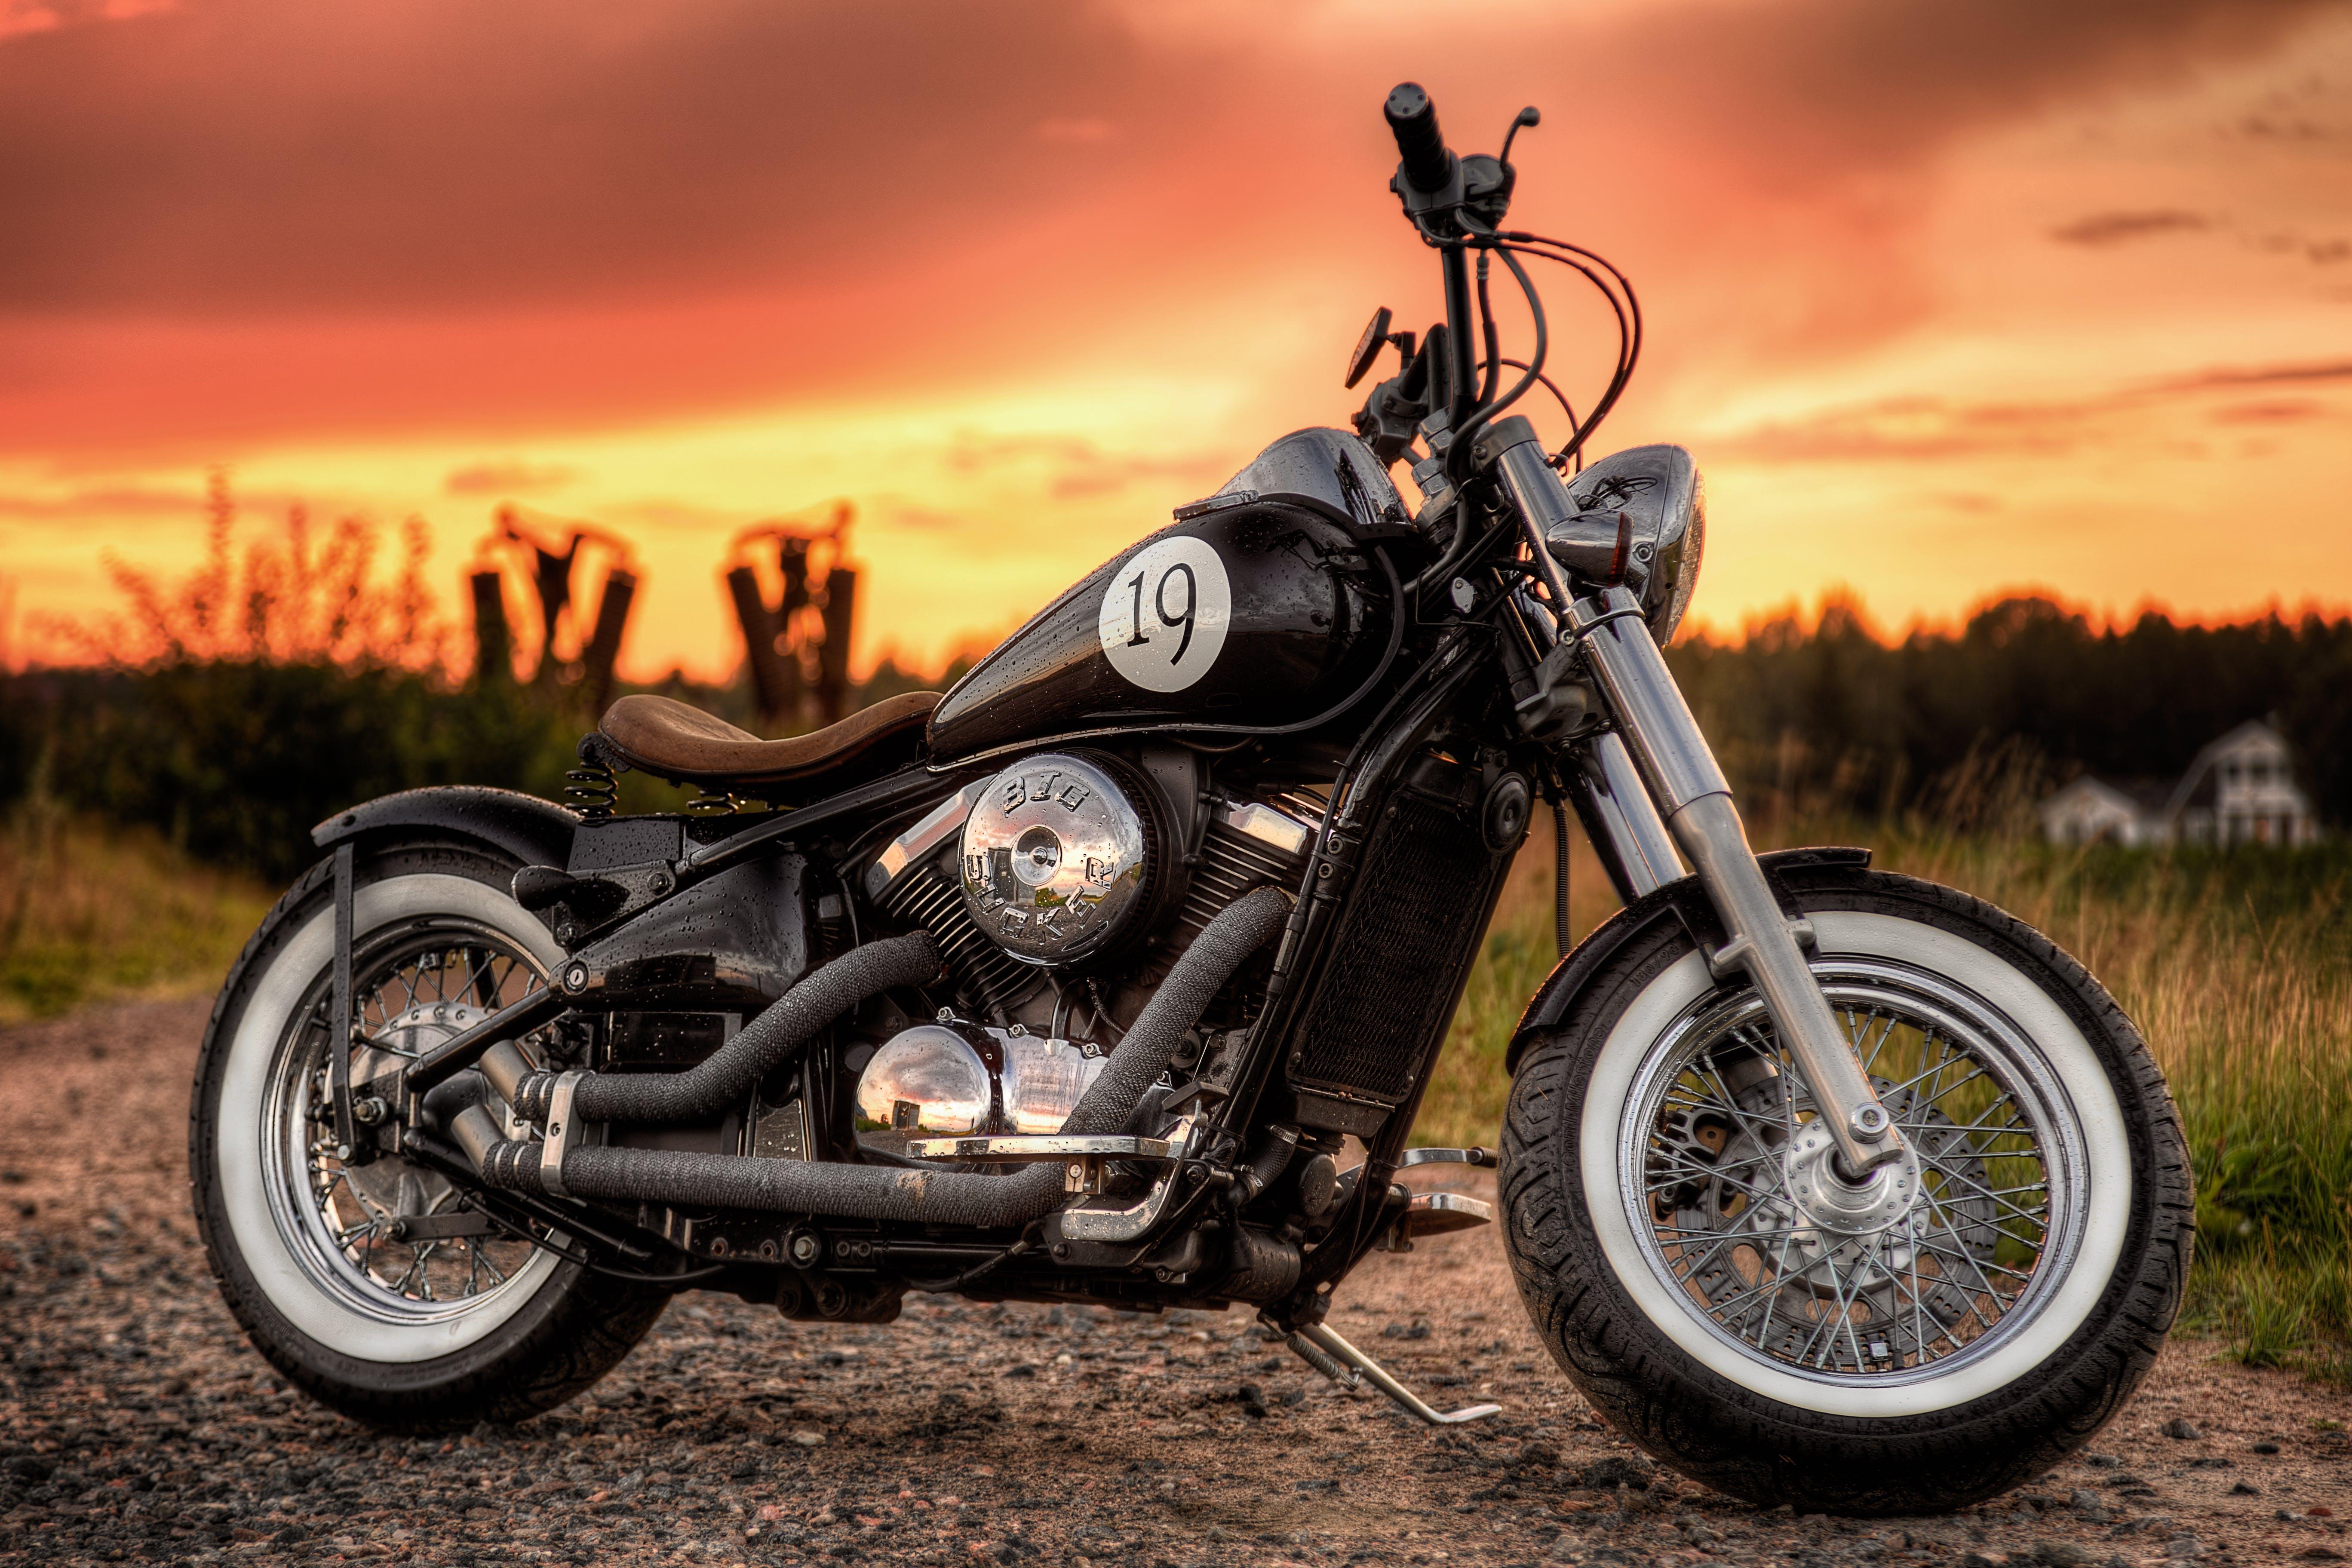 Free stock photo of bobber, kawasaki, motorcycle, sunset